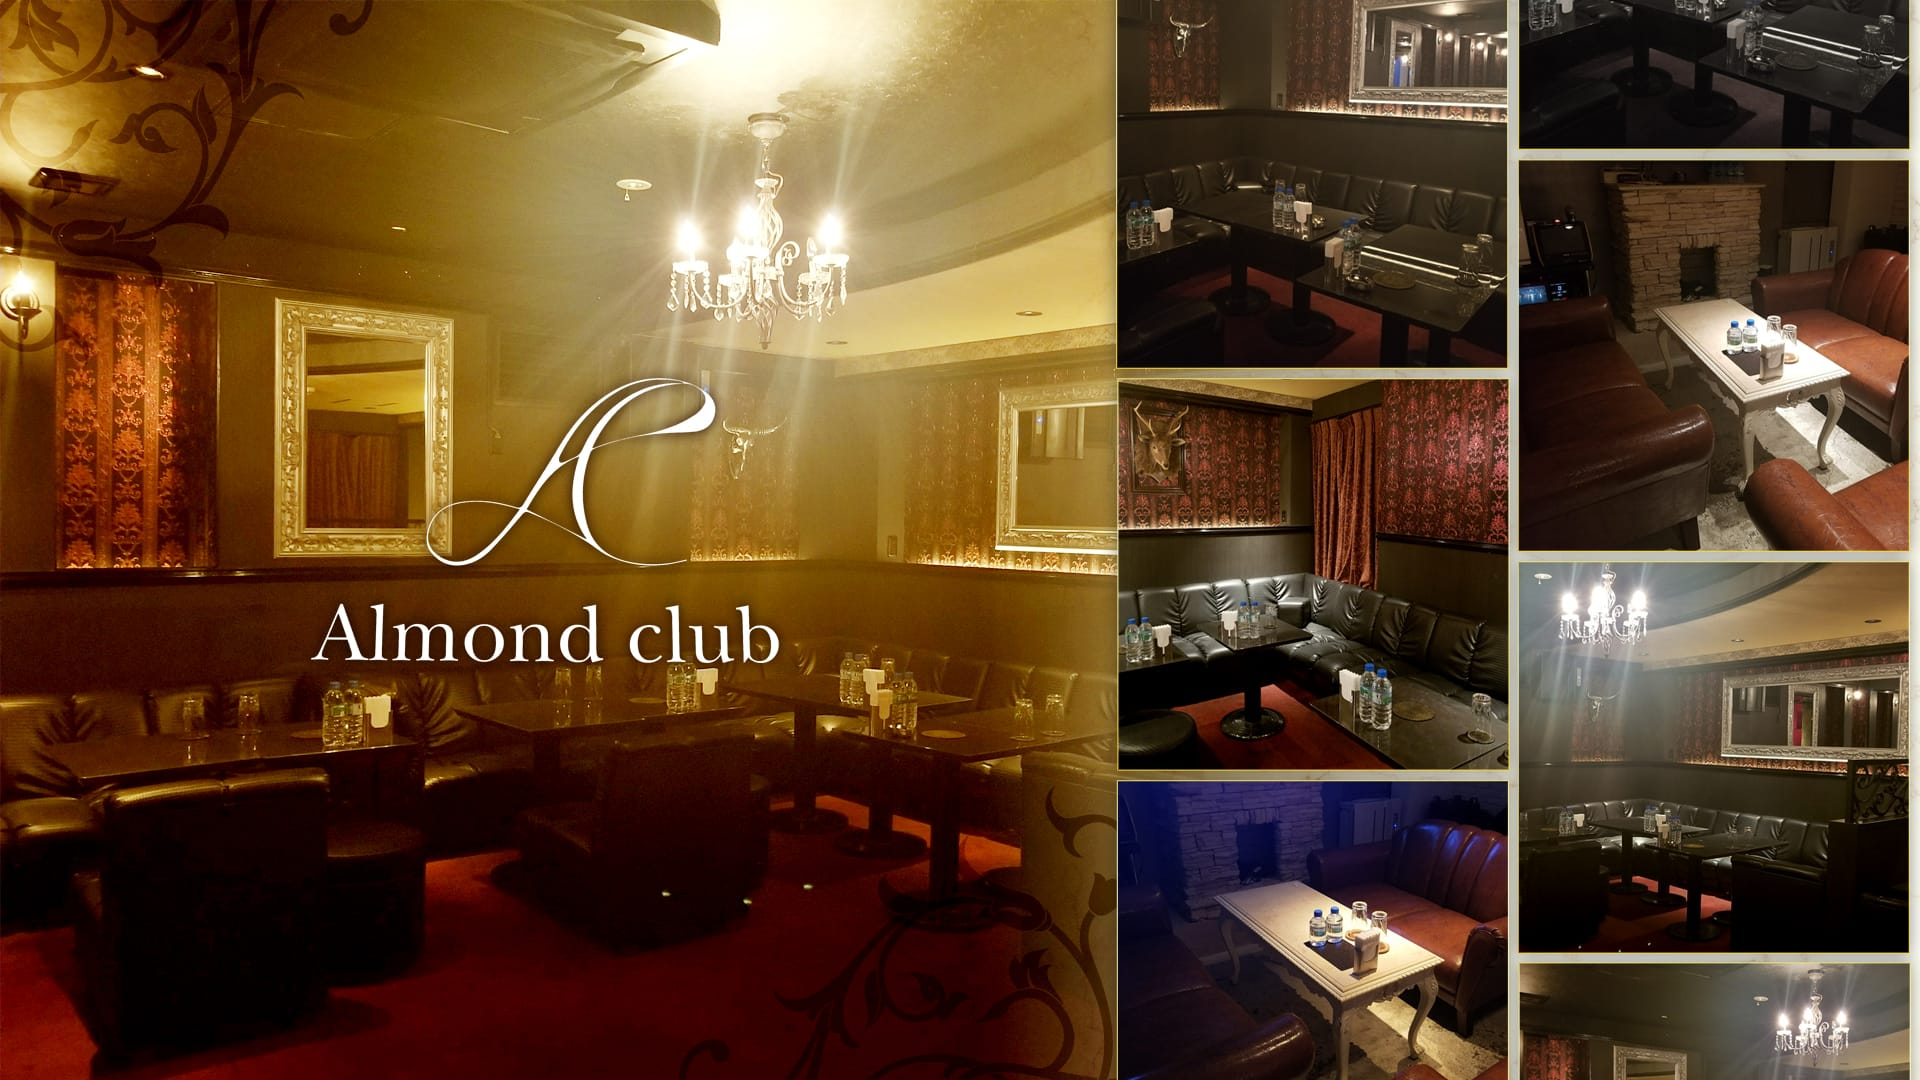 ALMONDCLUB[アマンドクラブ] TOP画像